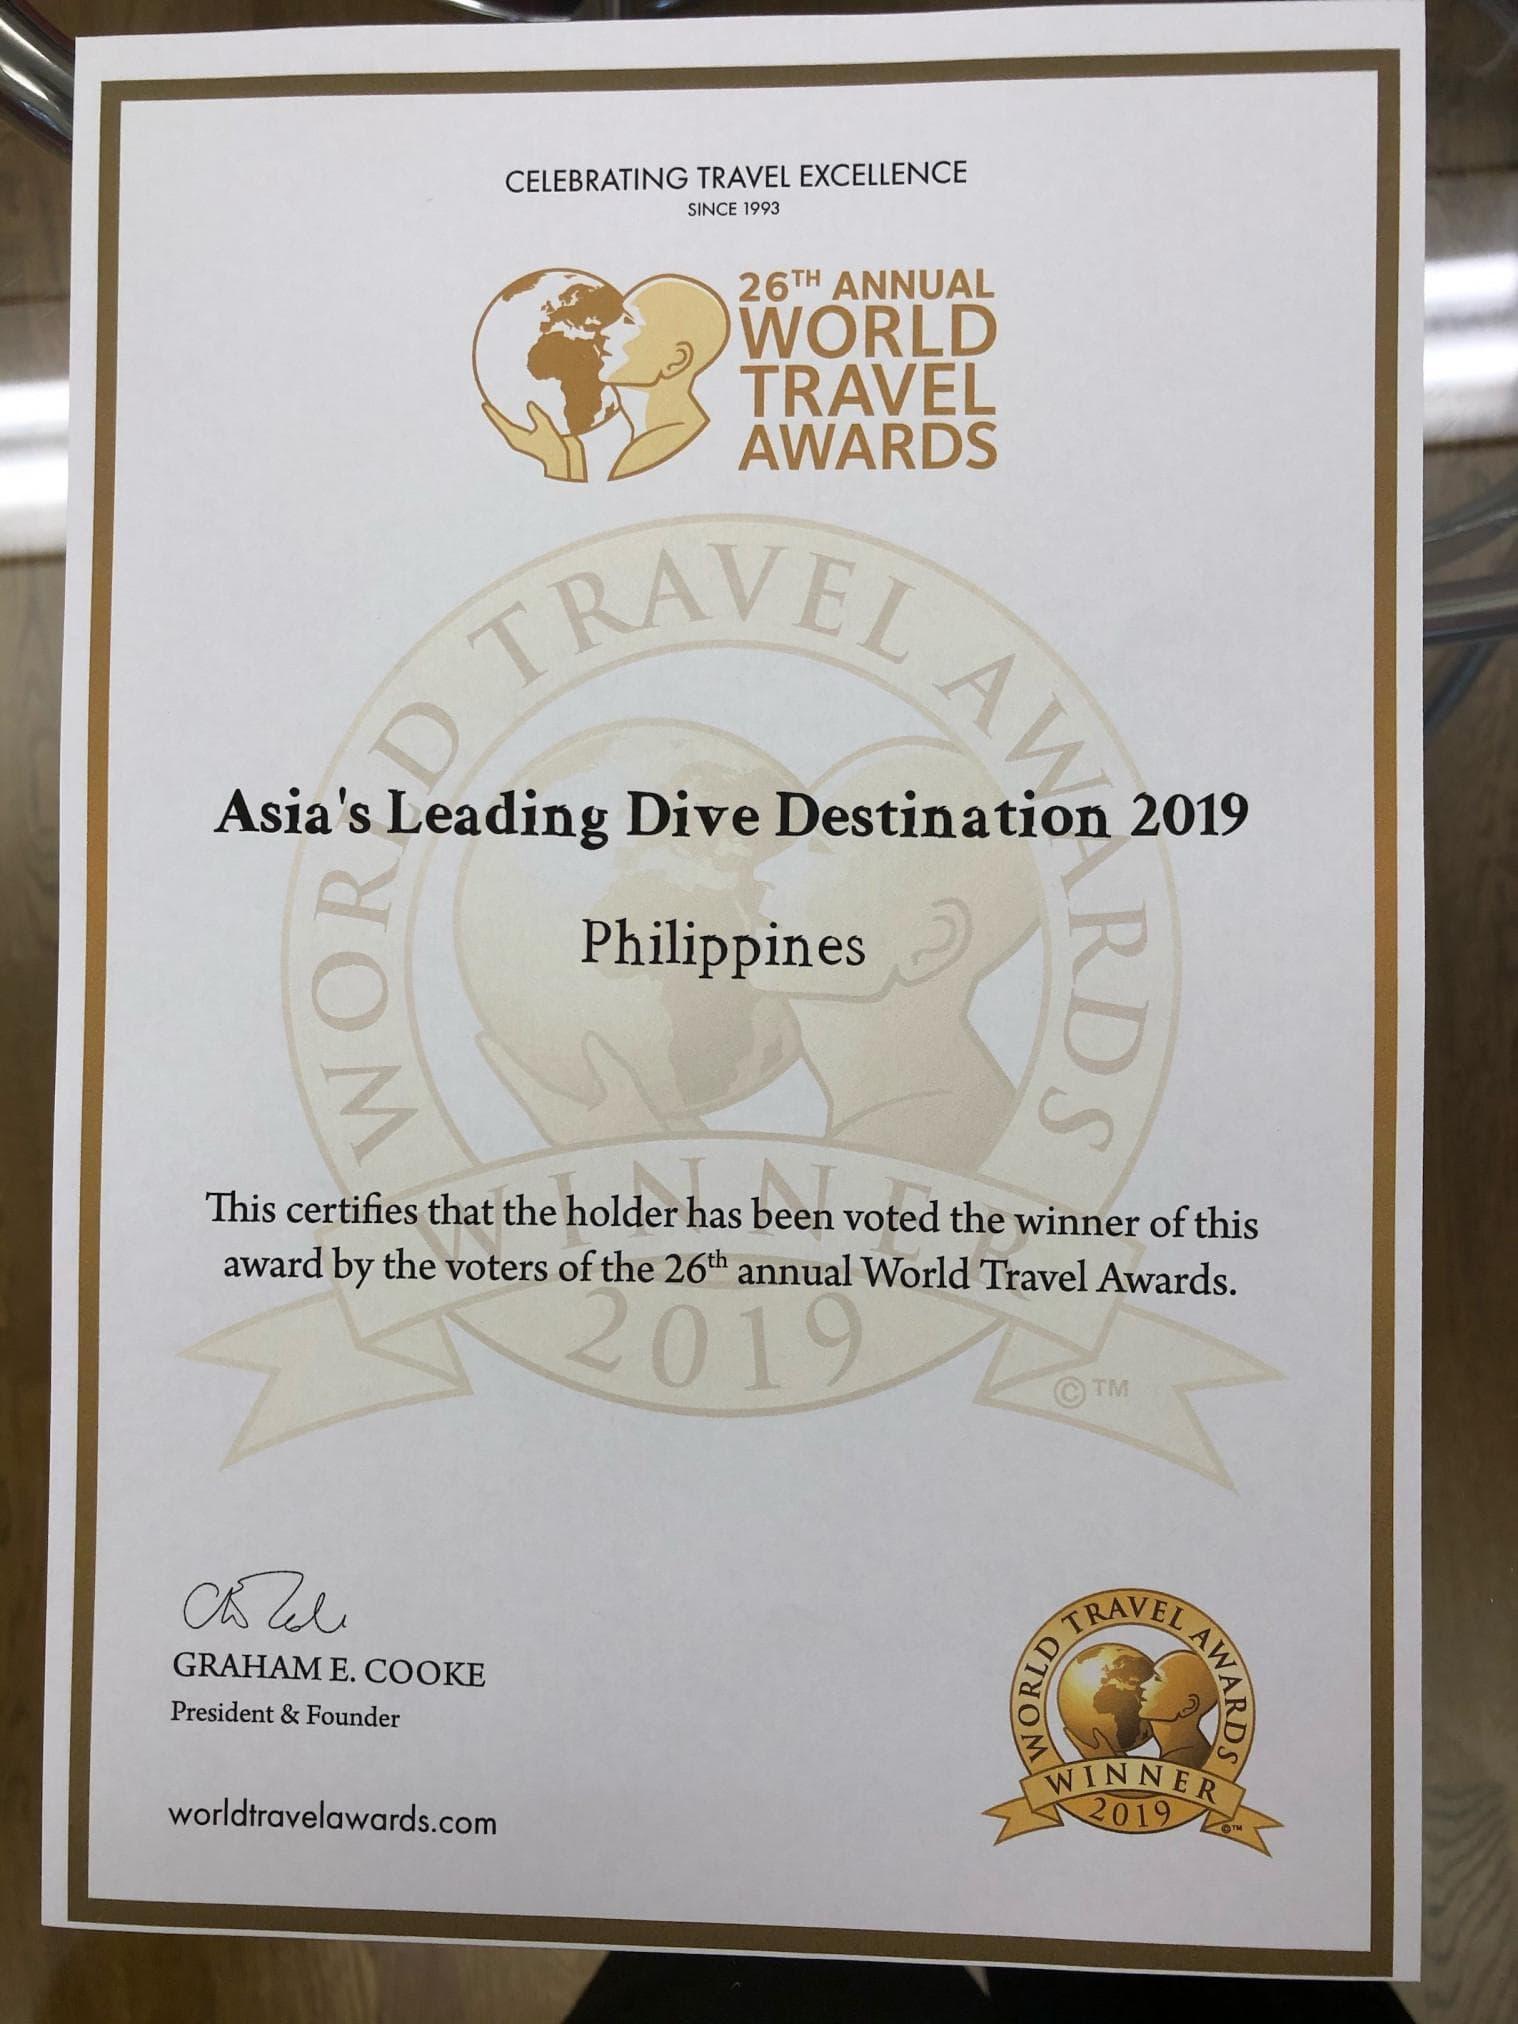 Asia's leading dive designations 2019 award certificate